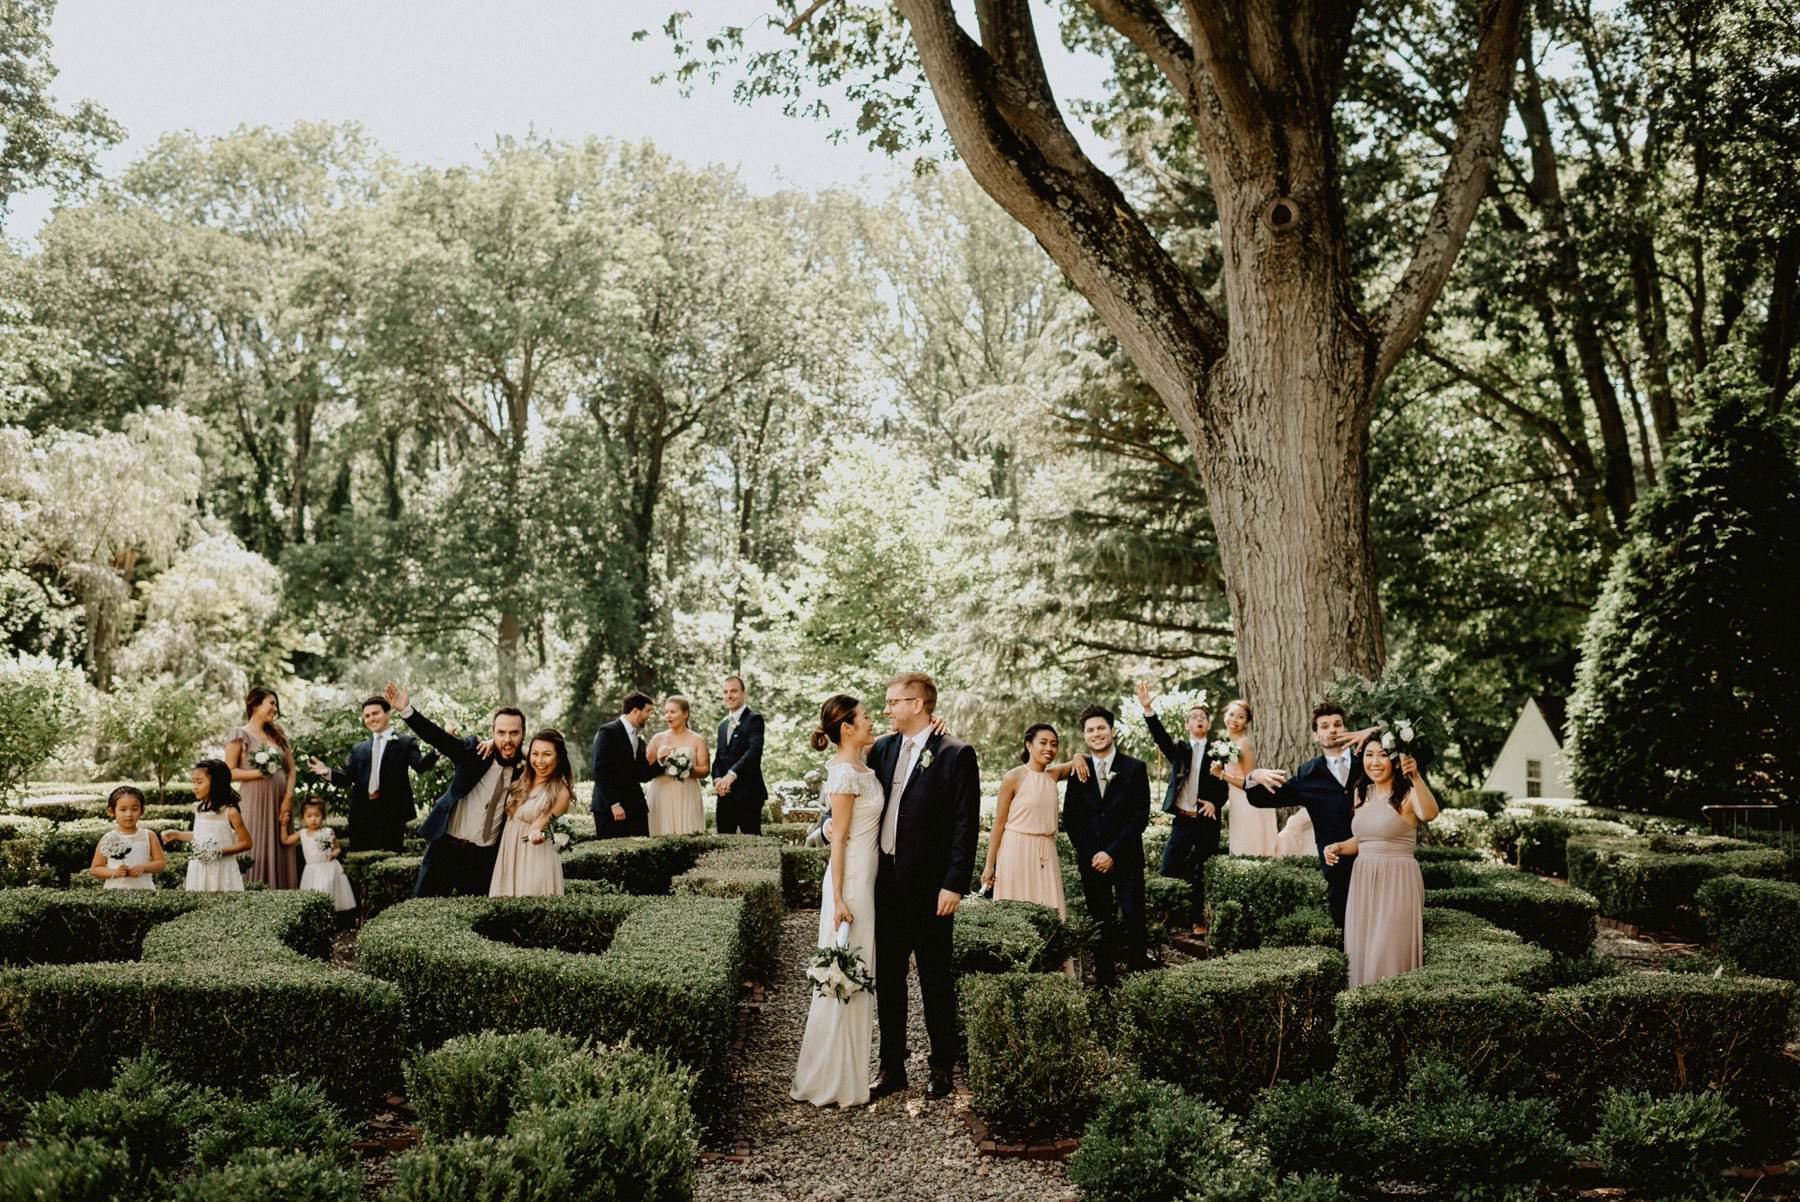 Appleford-estate-wedding-56.jpg